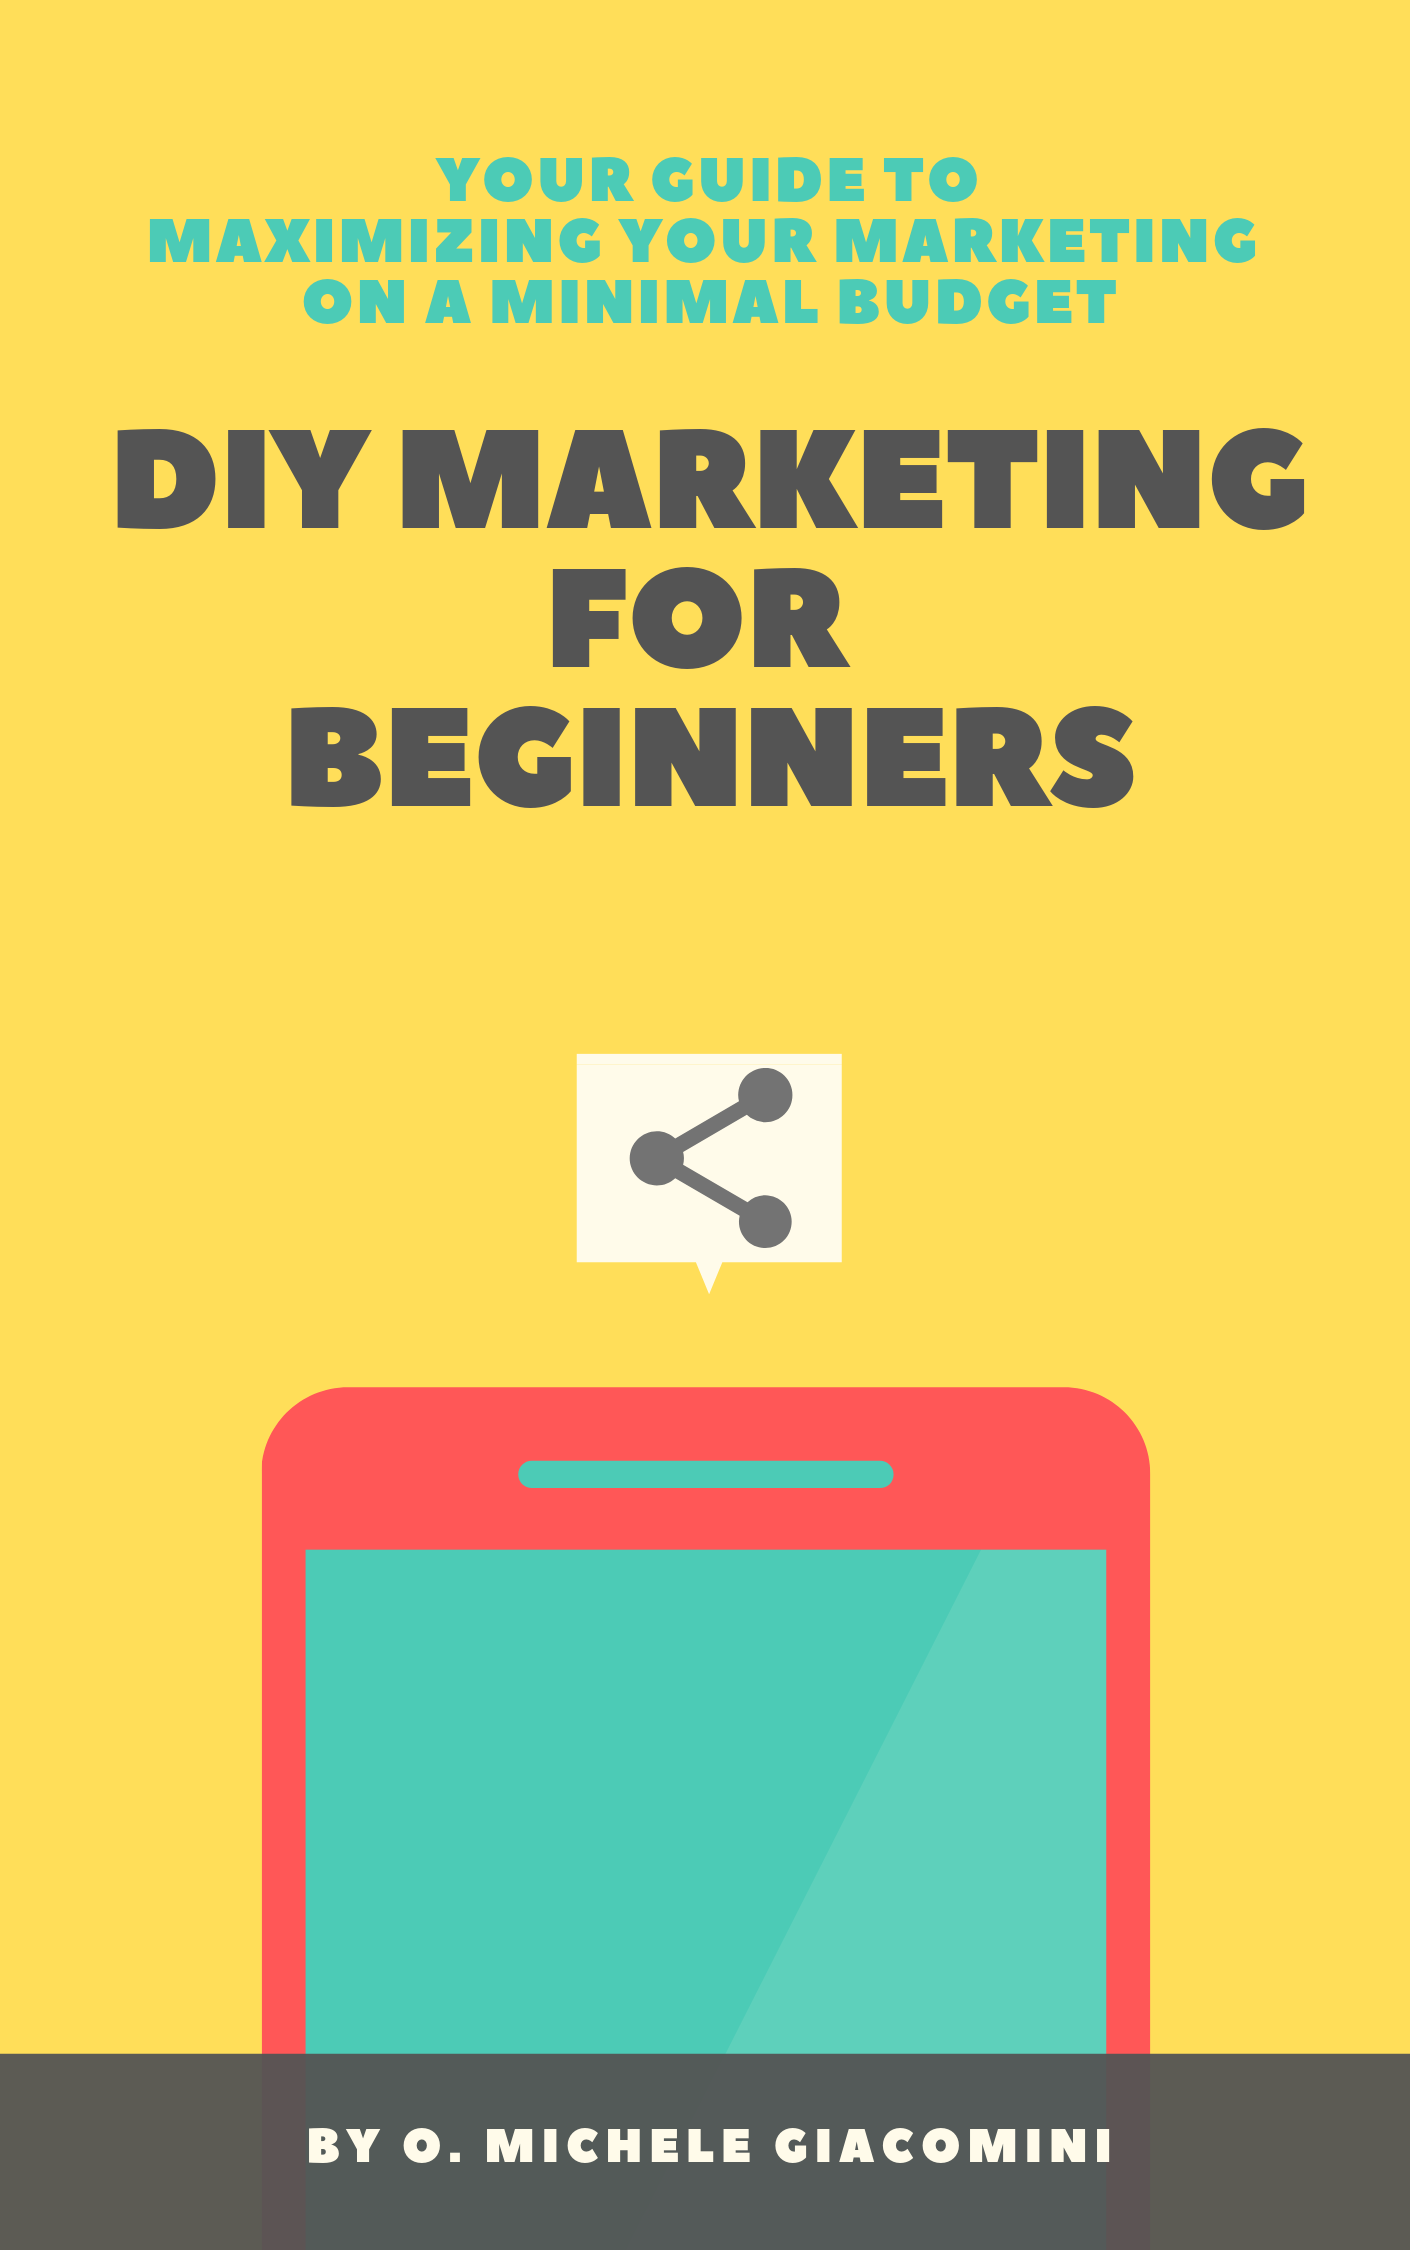 4 Day DIY Marketing Challenge